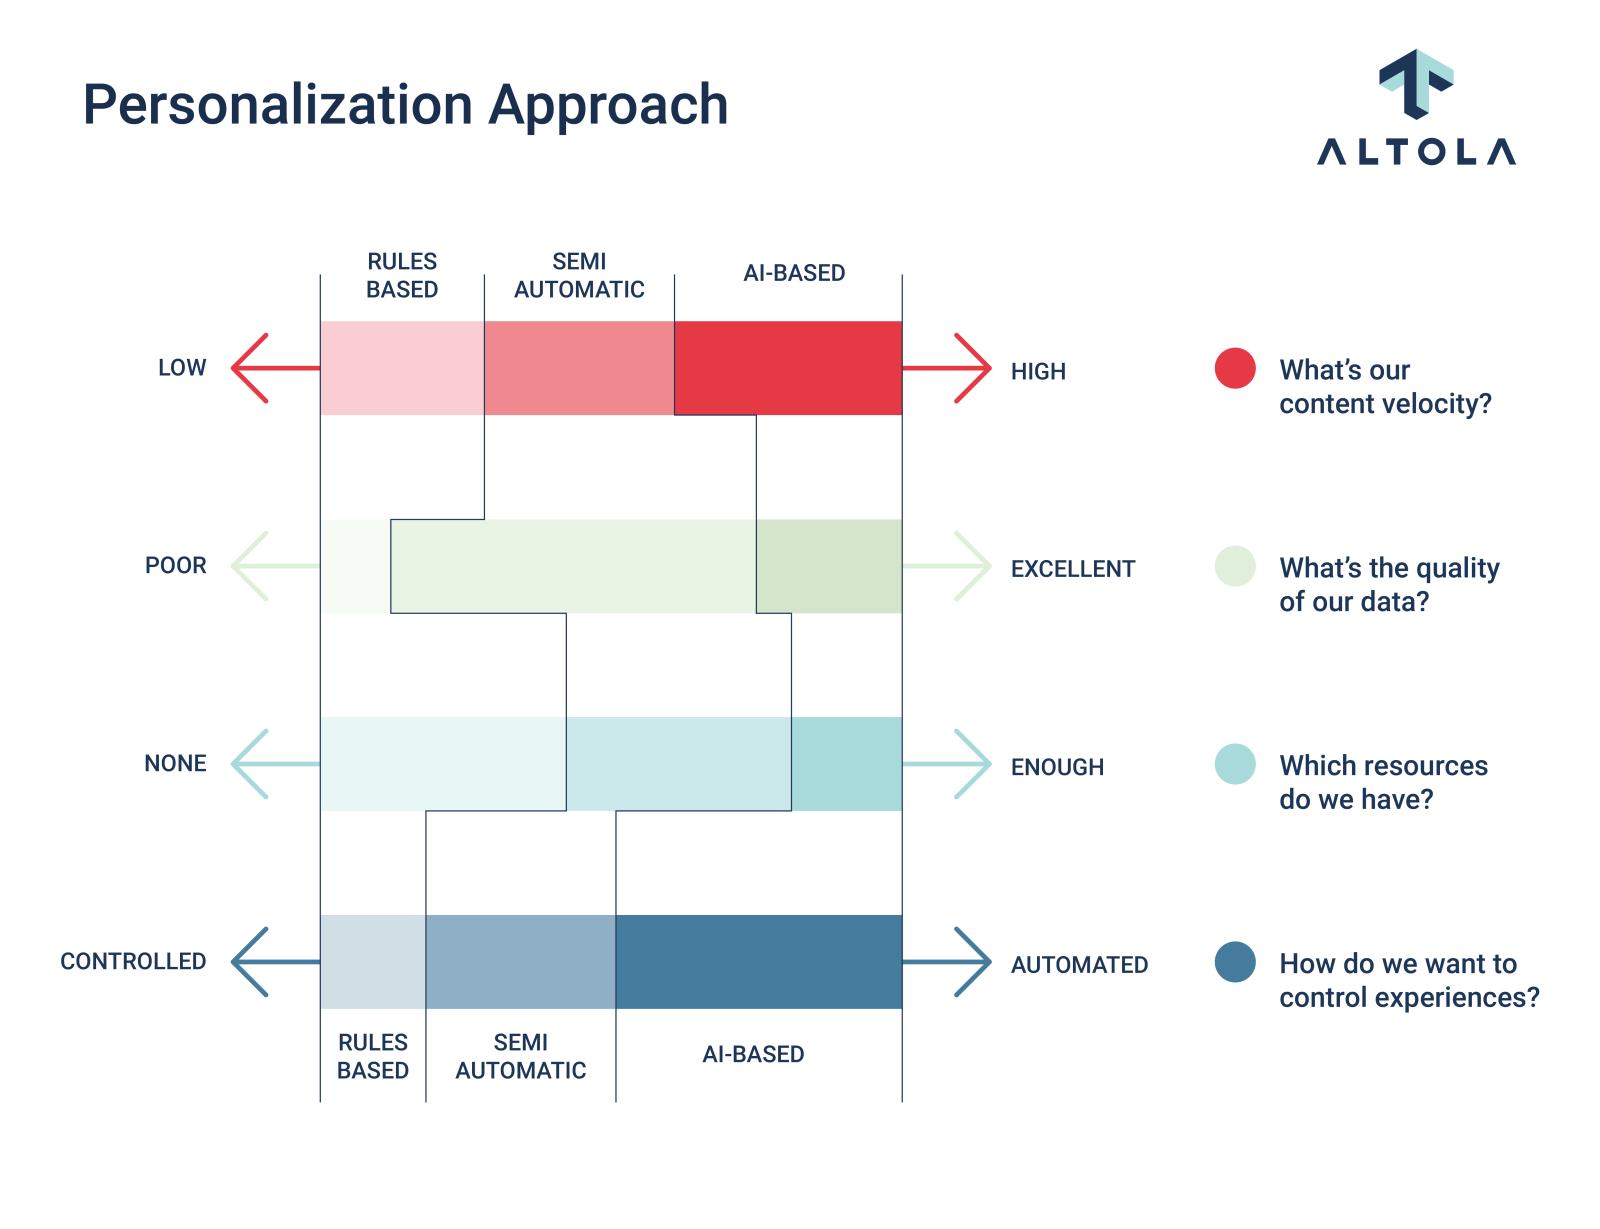 Altola Personalization Approach